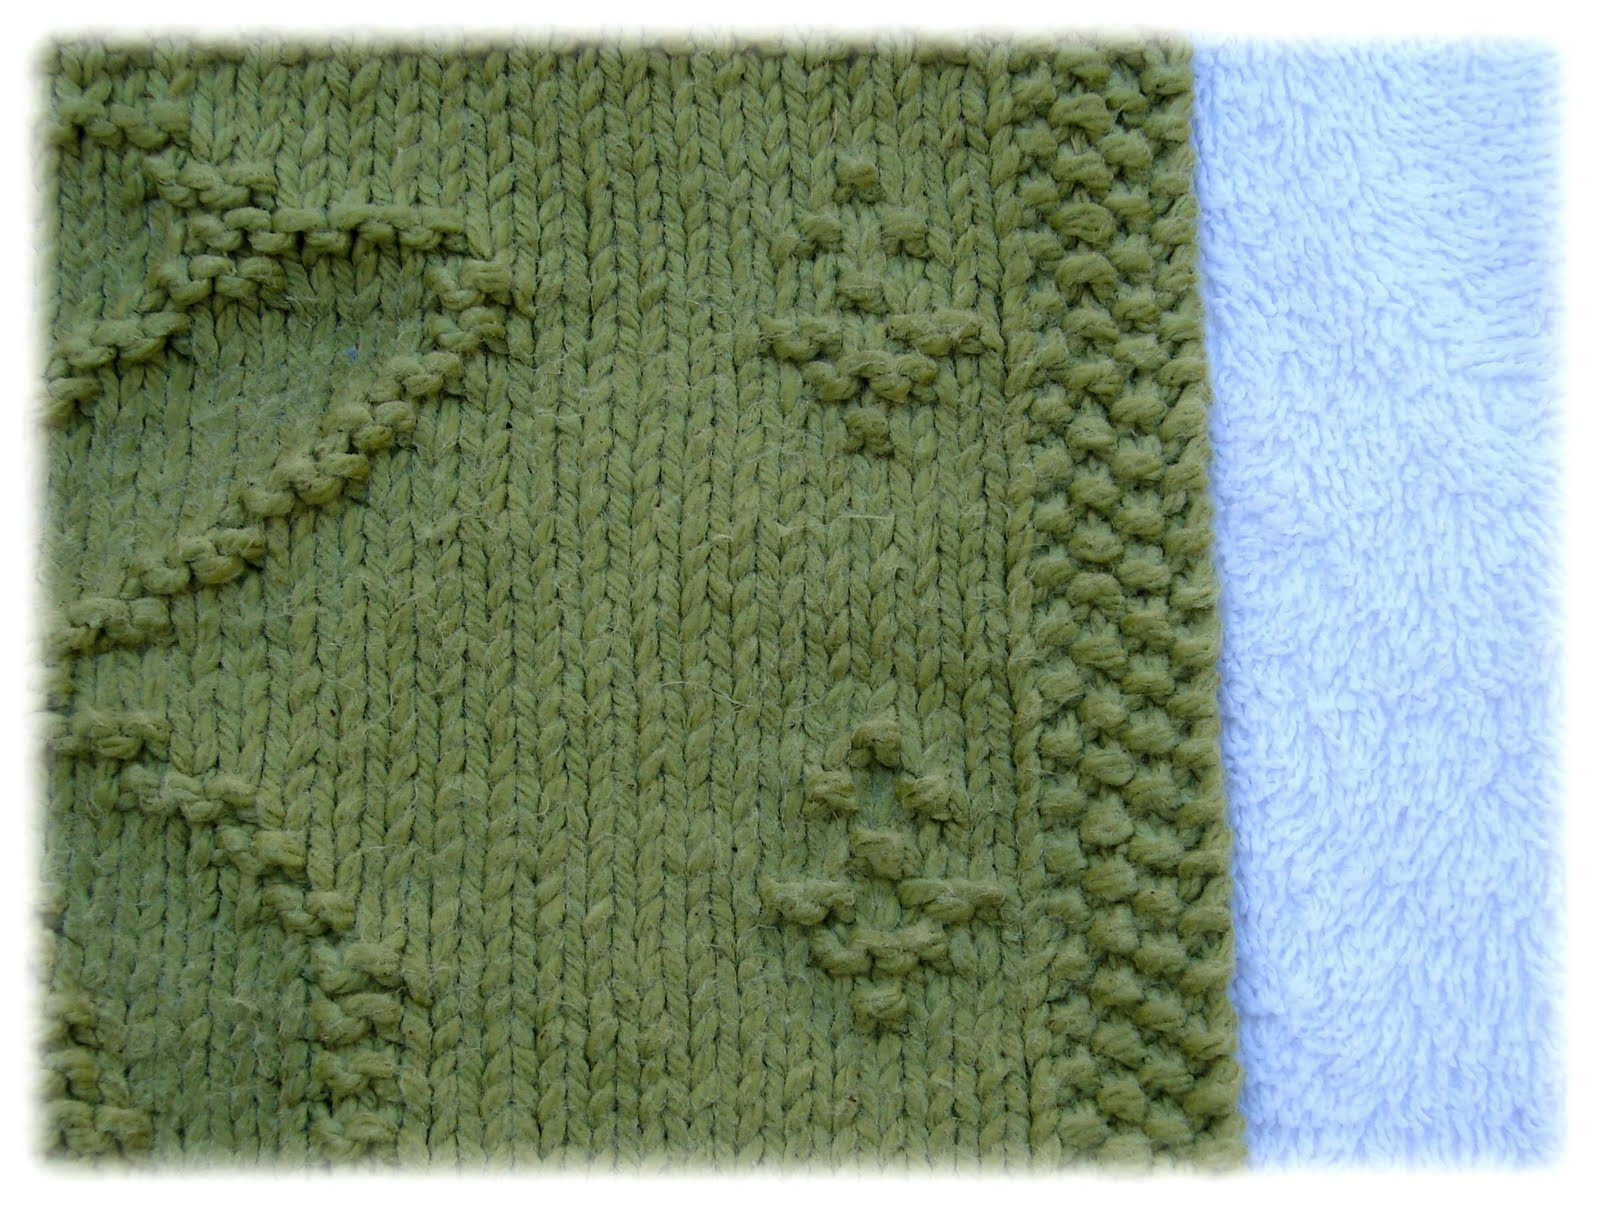 Knitting Roomfi : Rachel s knitting room how do you block your patterns